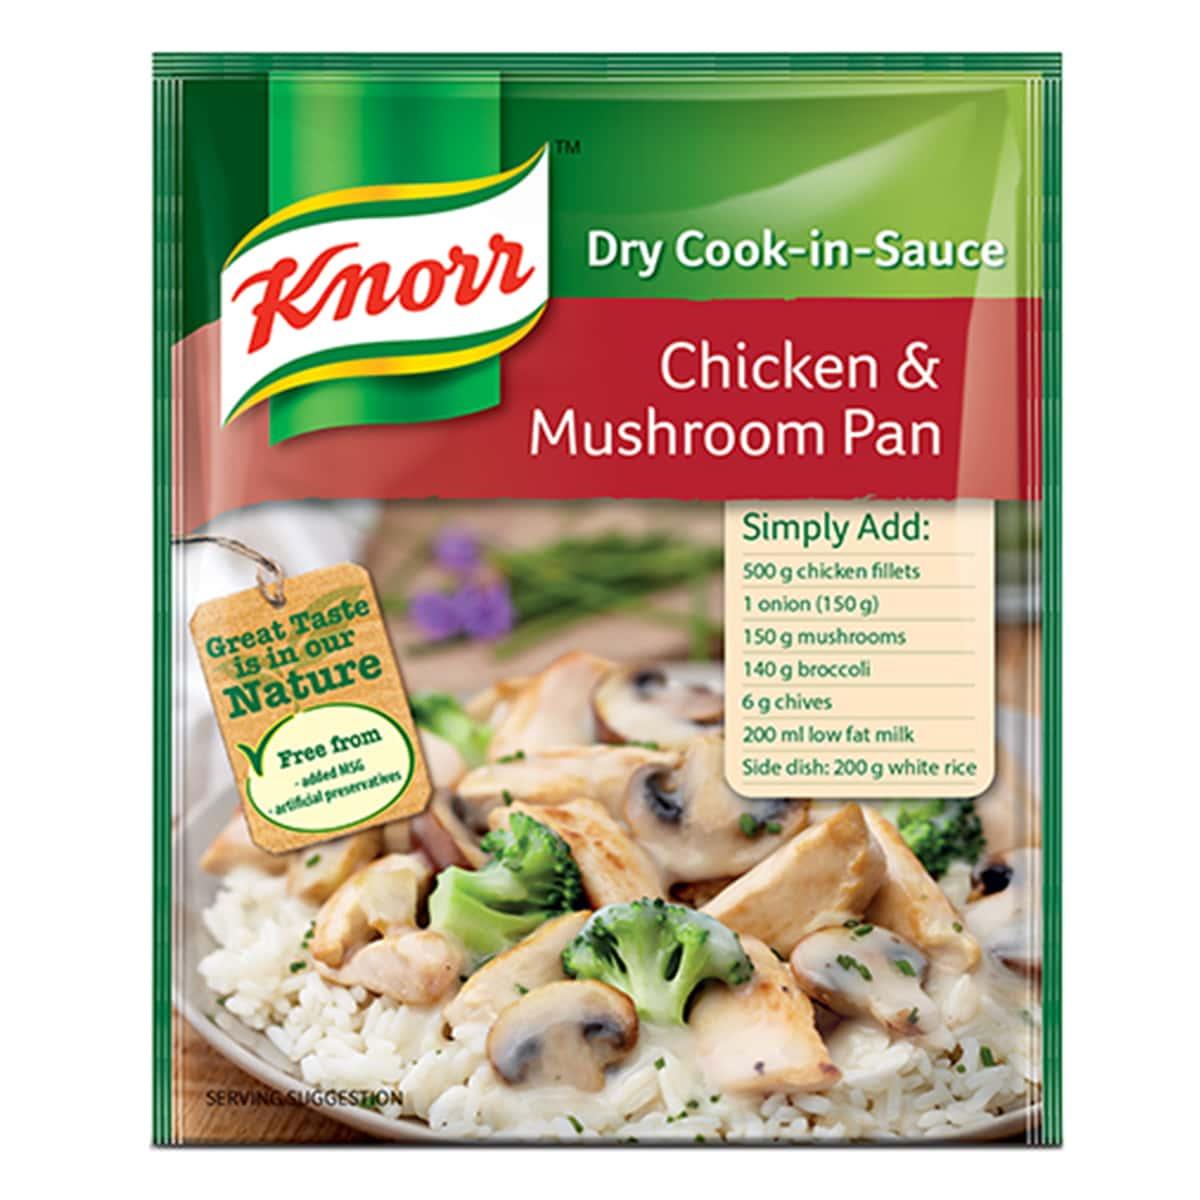 Buy Knorr Chicken and Mushroom Pan (Dry Cook in Sauce) - 48 gm